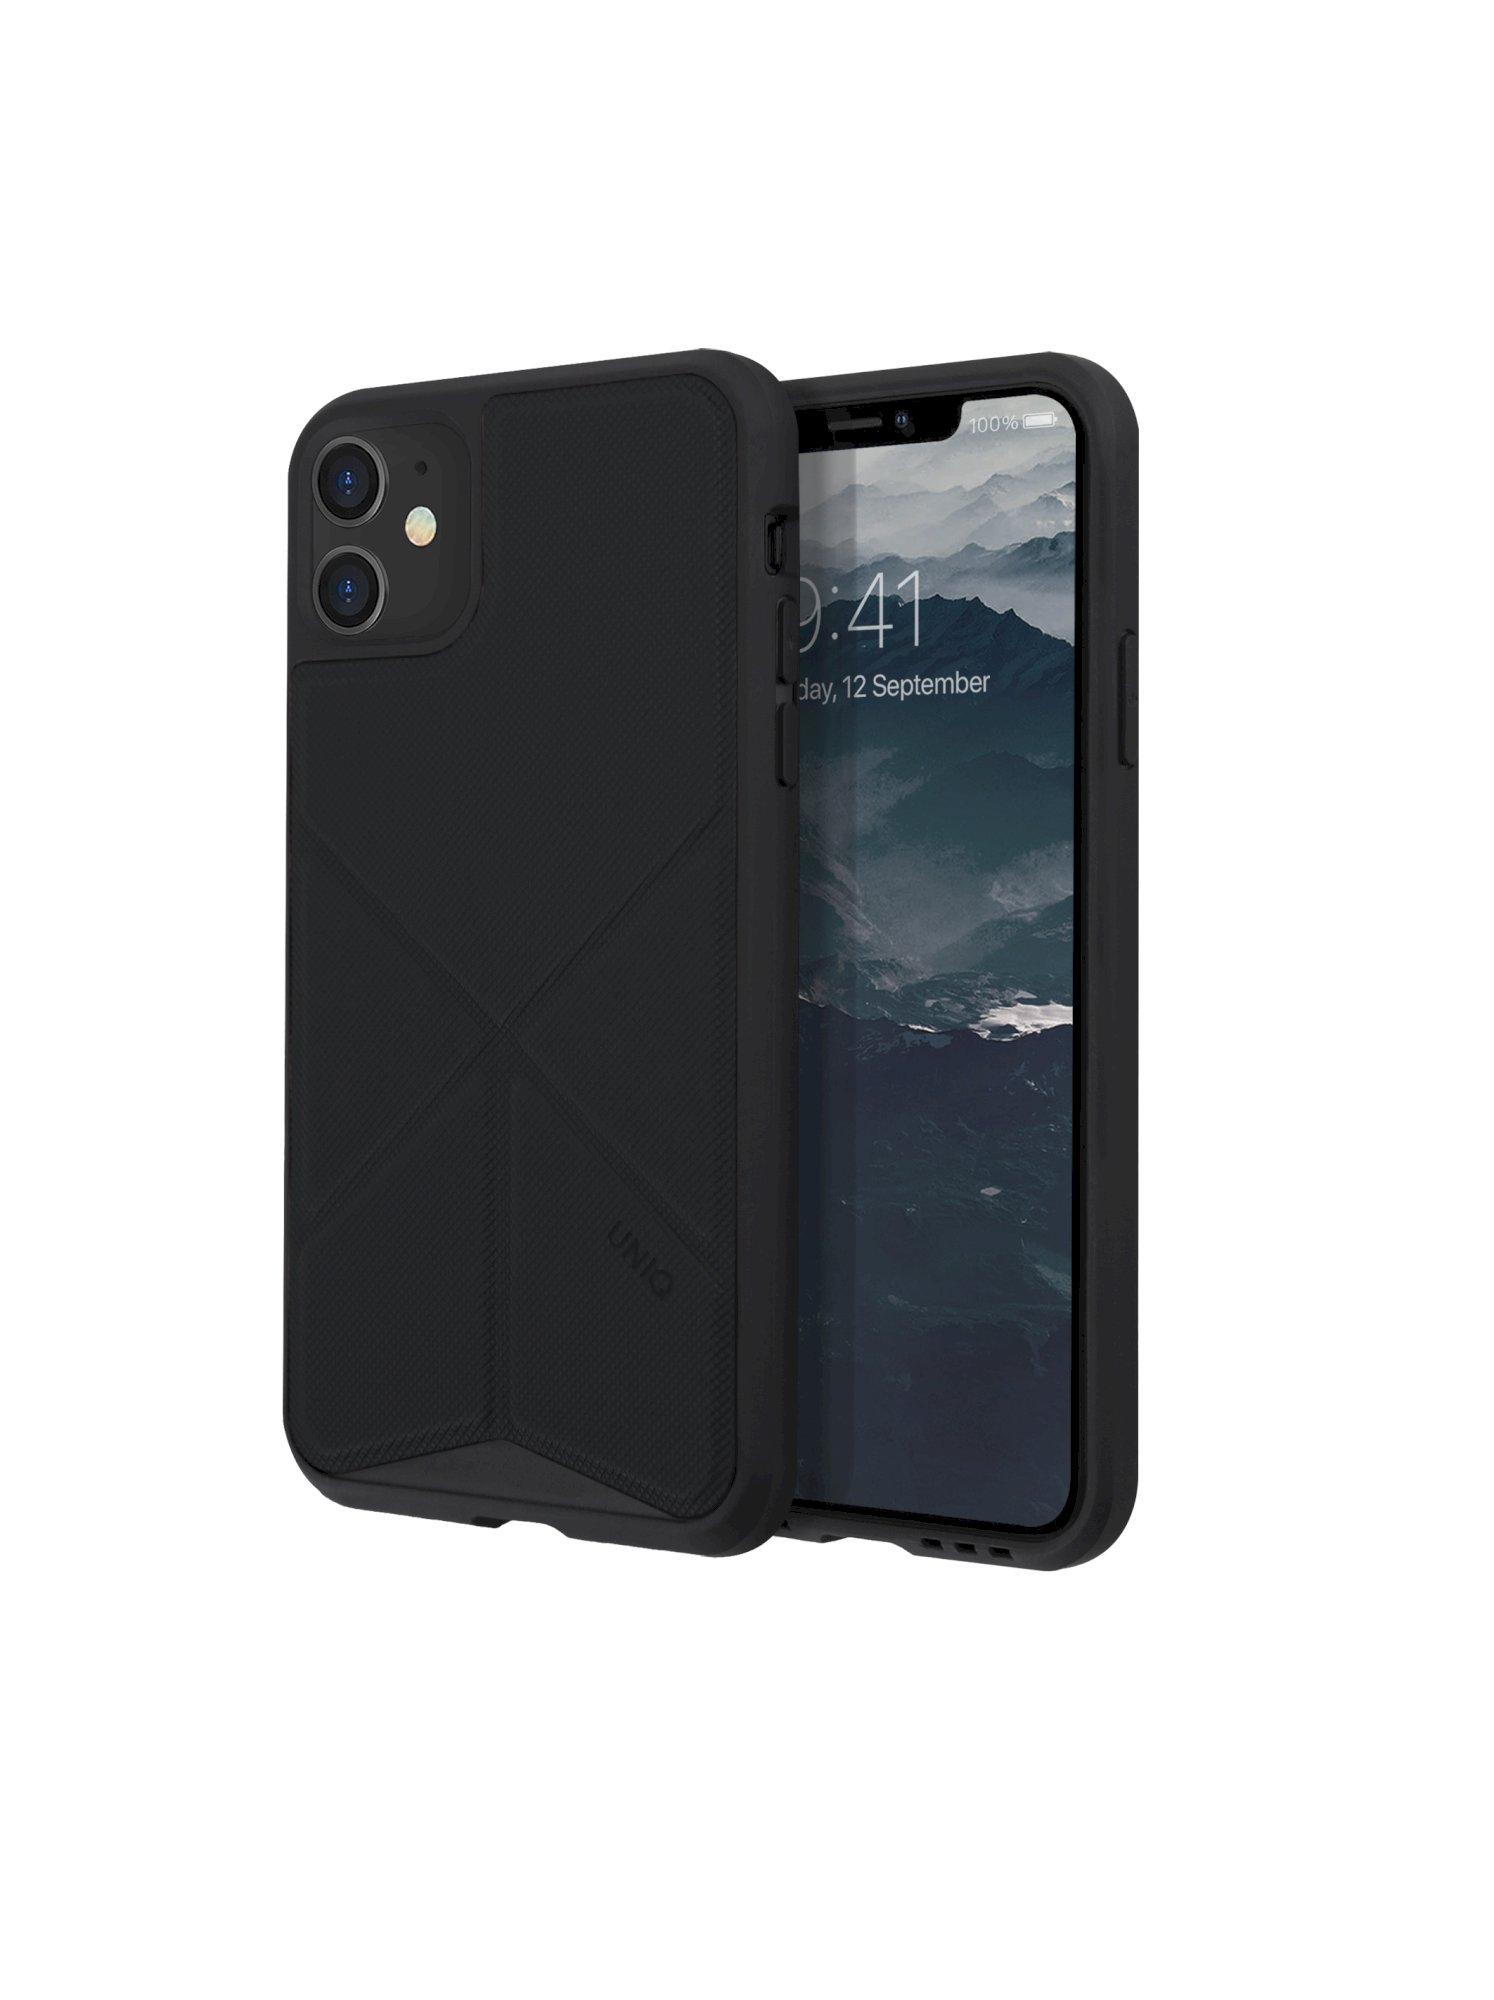 iPhone 11, case transforma, stand up ebony, black